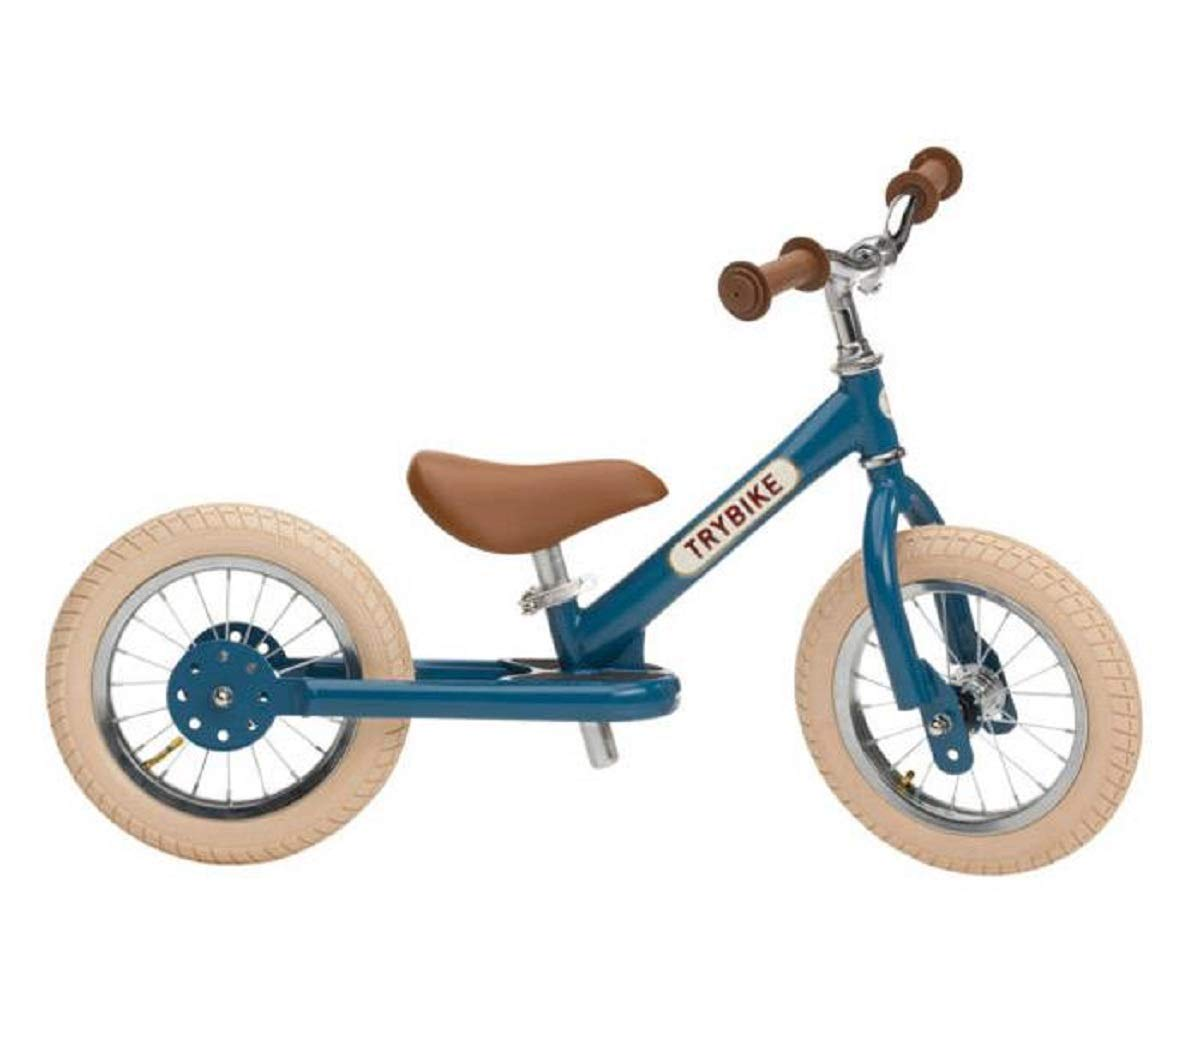 Trybike Draisienne Steel Blue Vintage Edition